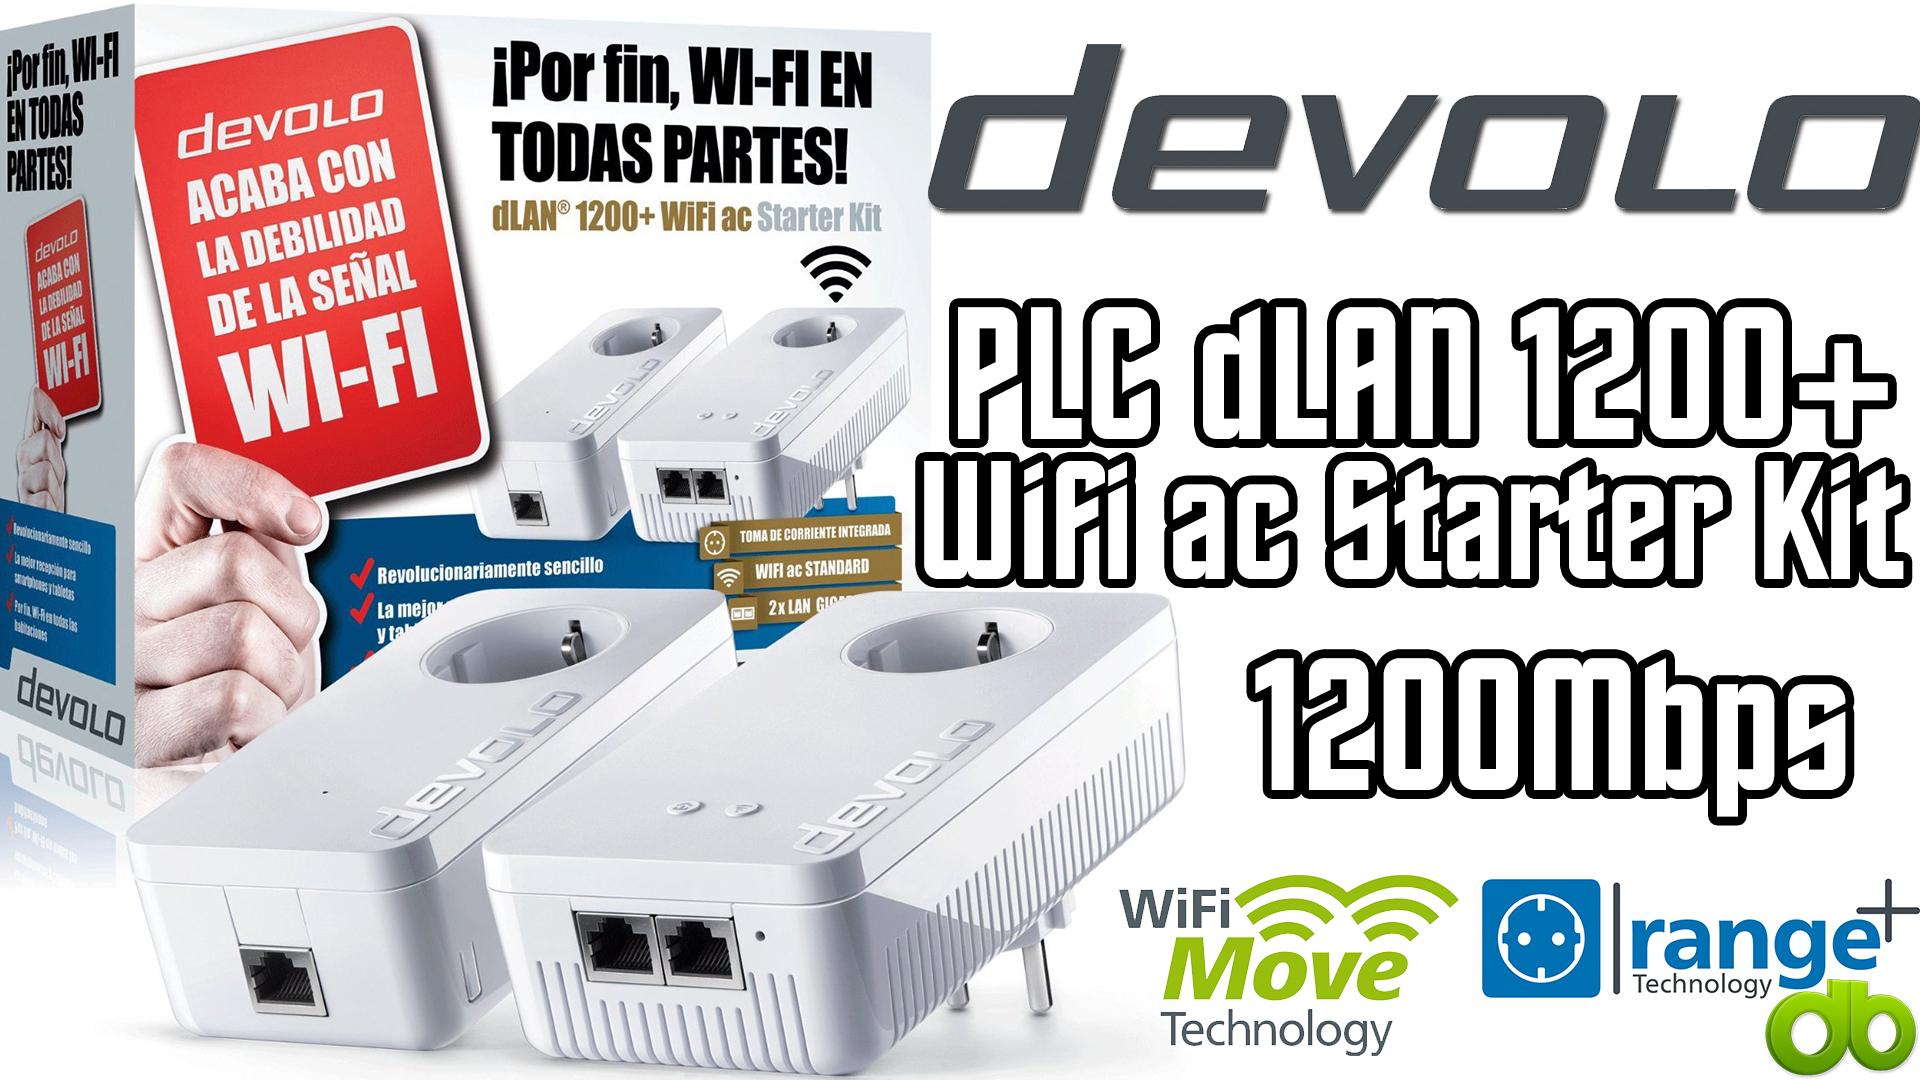 plc devolo dlan 1200 wifi ac starter kit powerline. Black Bedroom Furniture Sets. Home Design Ideas